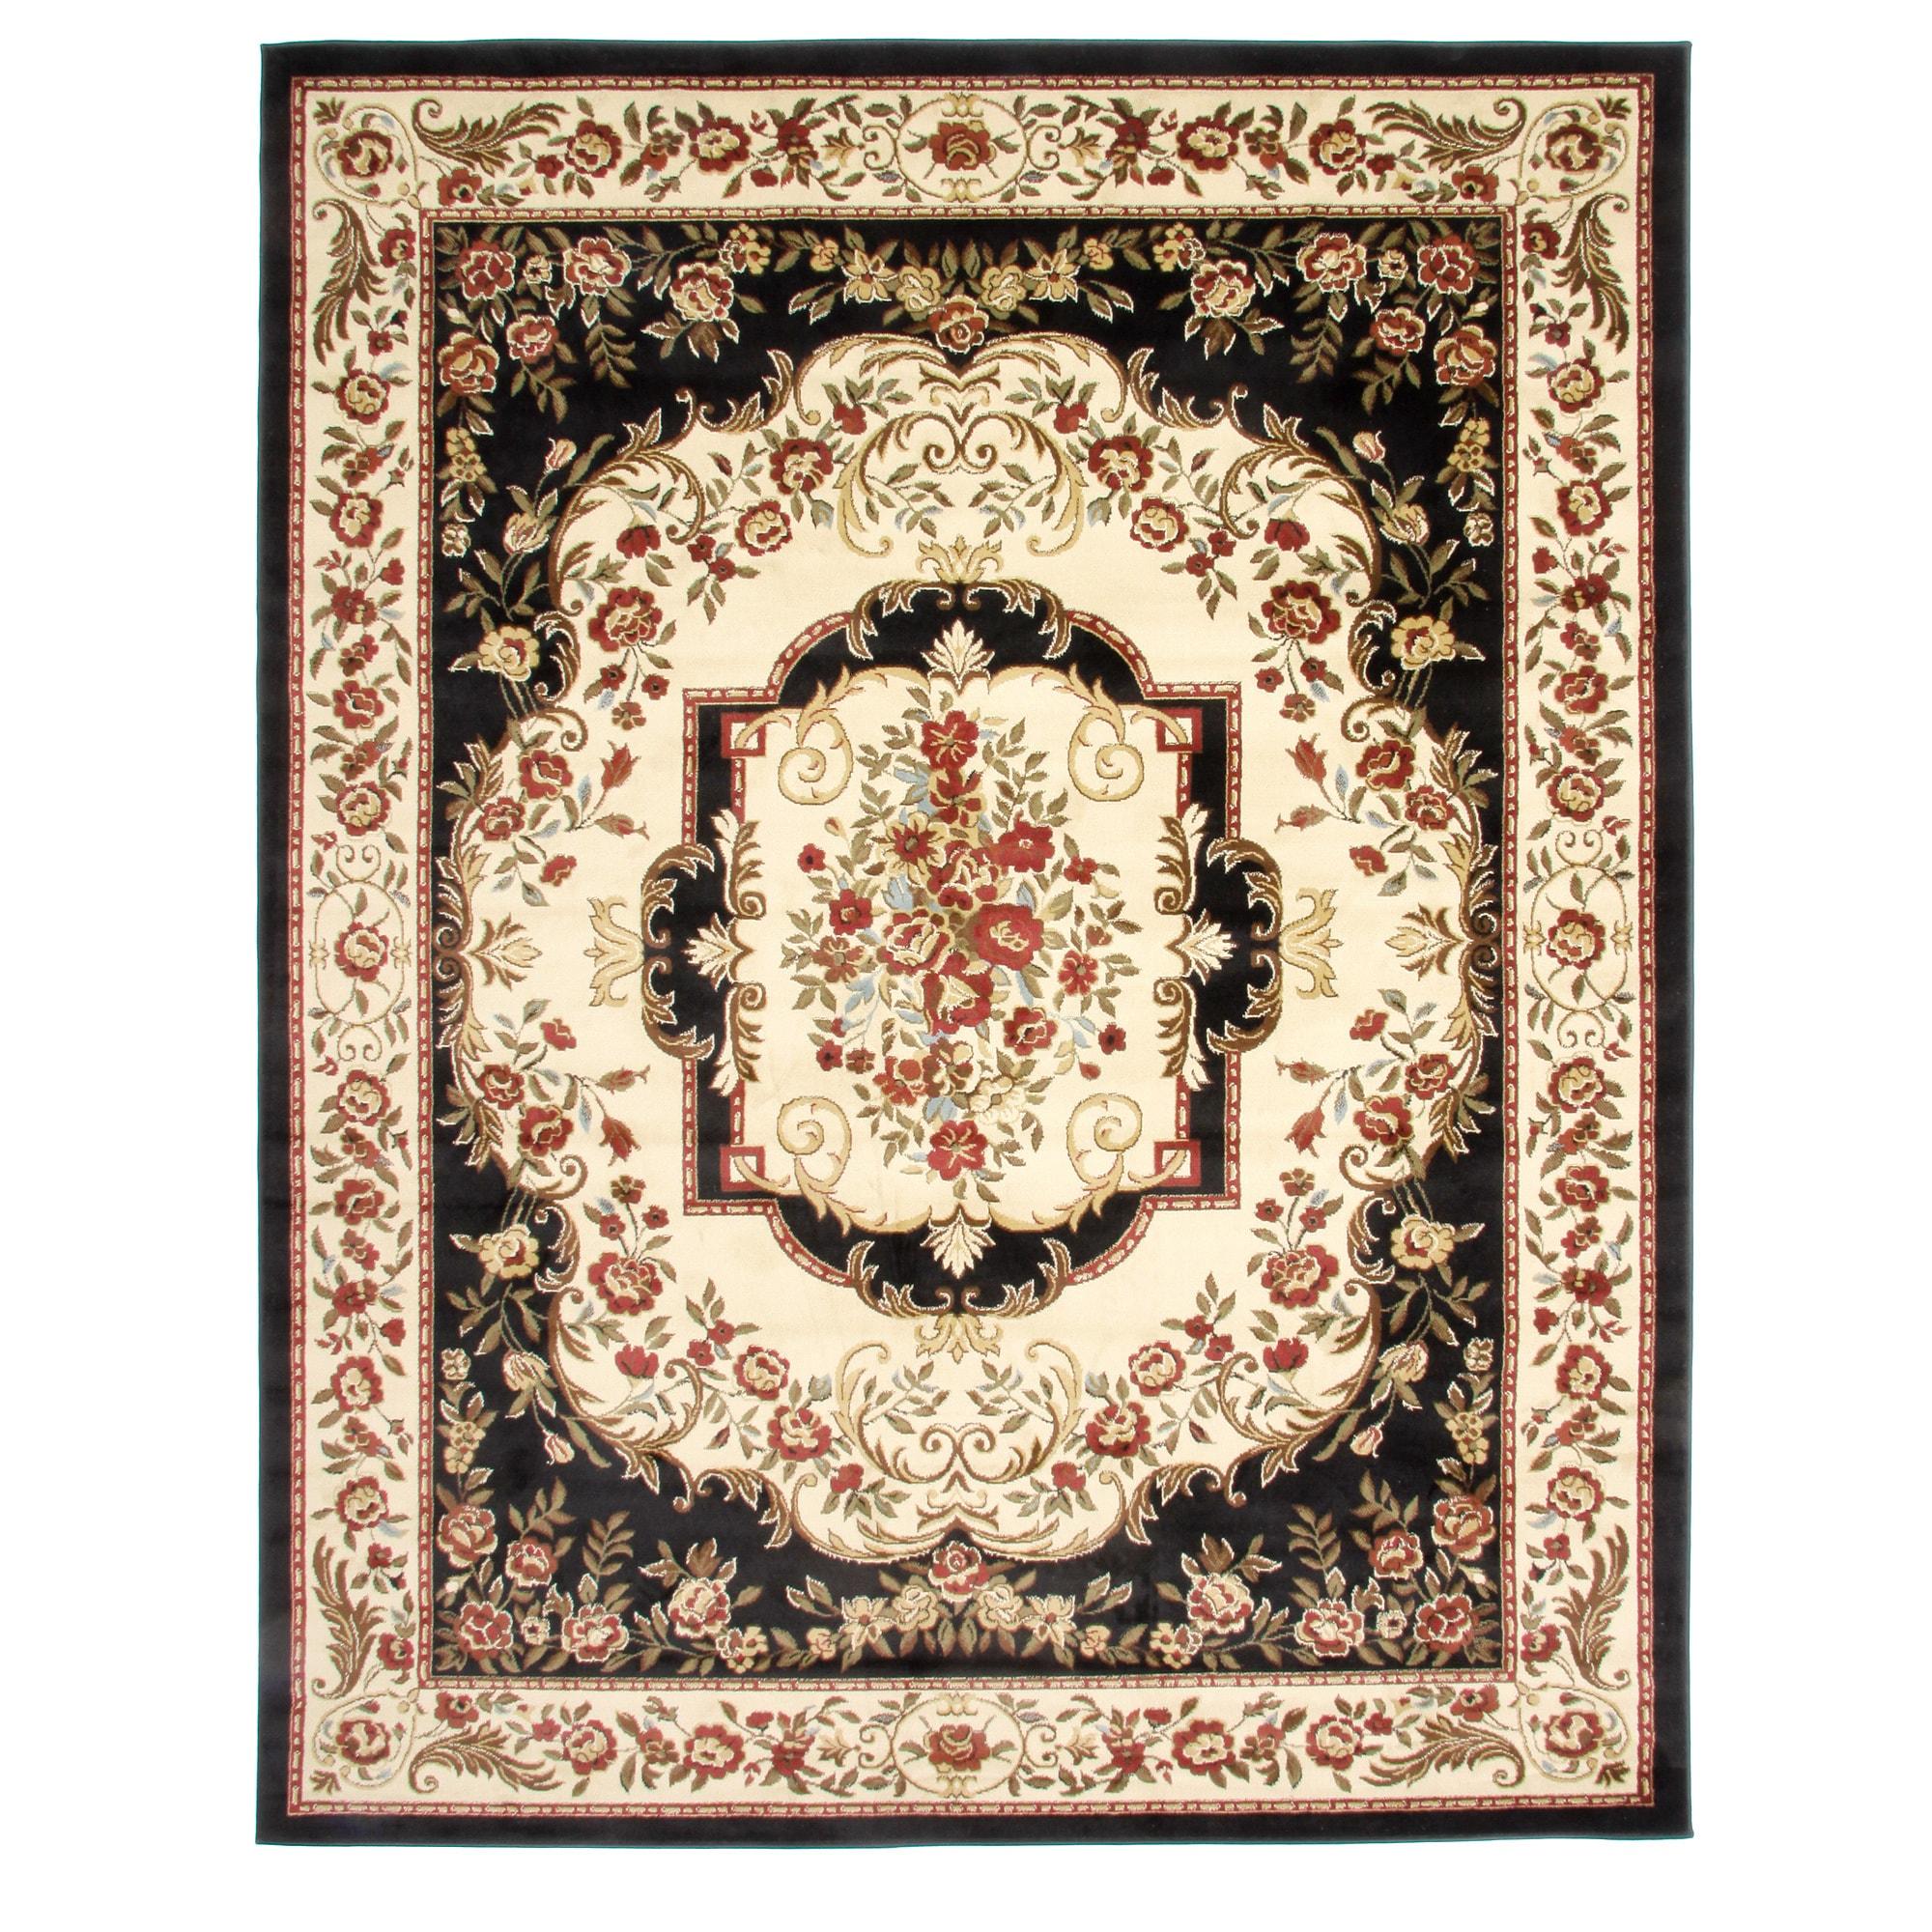 Overstock.com Traditional Ancient Empire Black Area Rug (7'10 x 9'10) at Sears.com